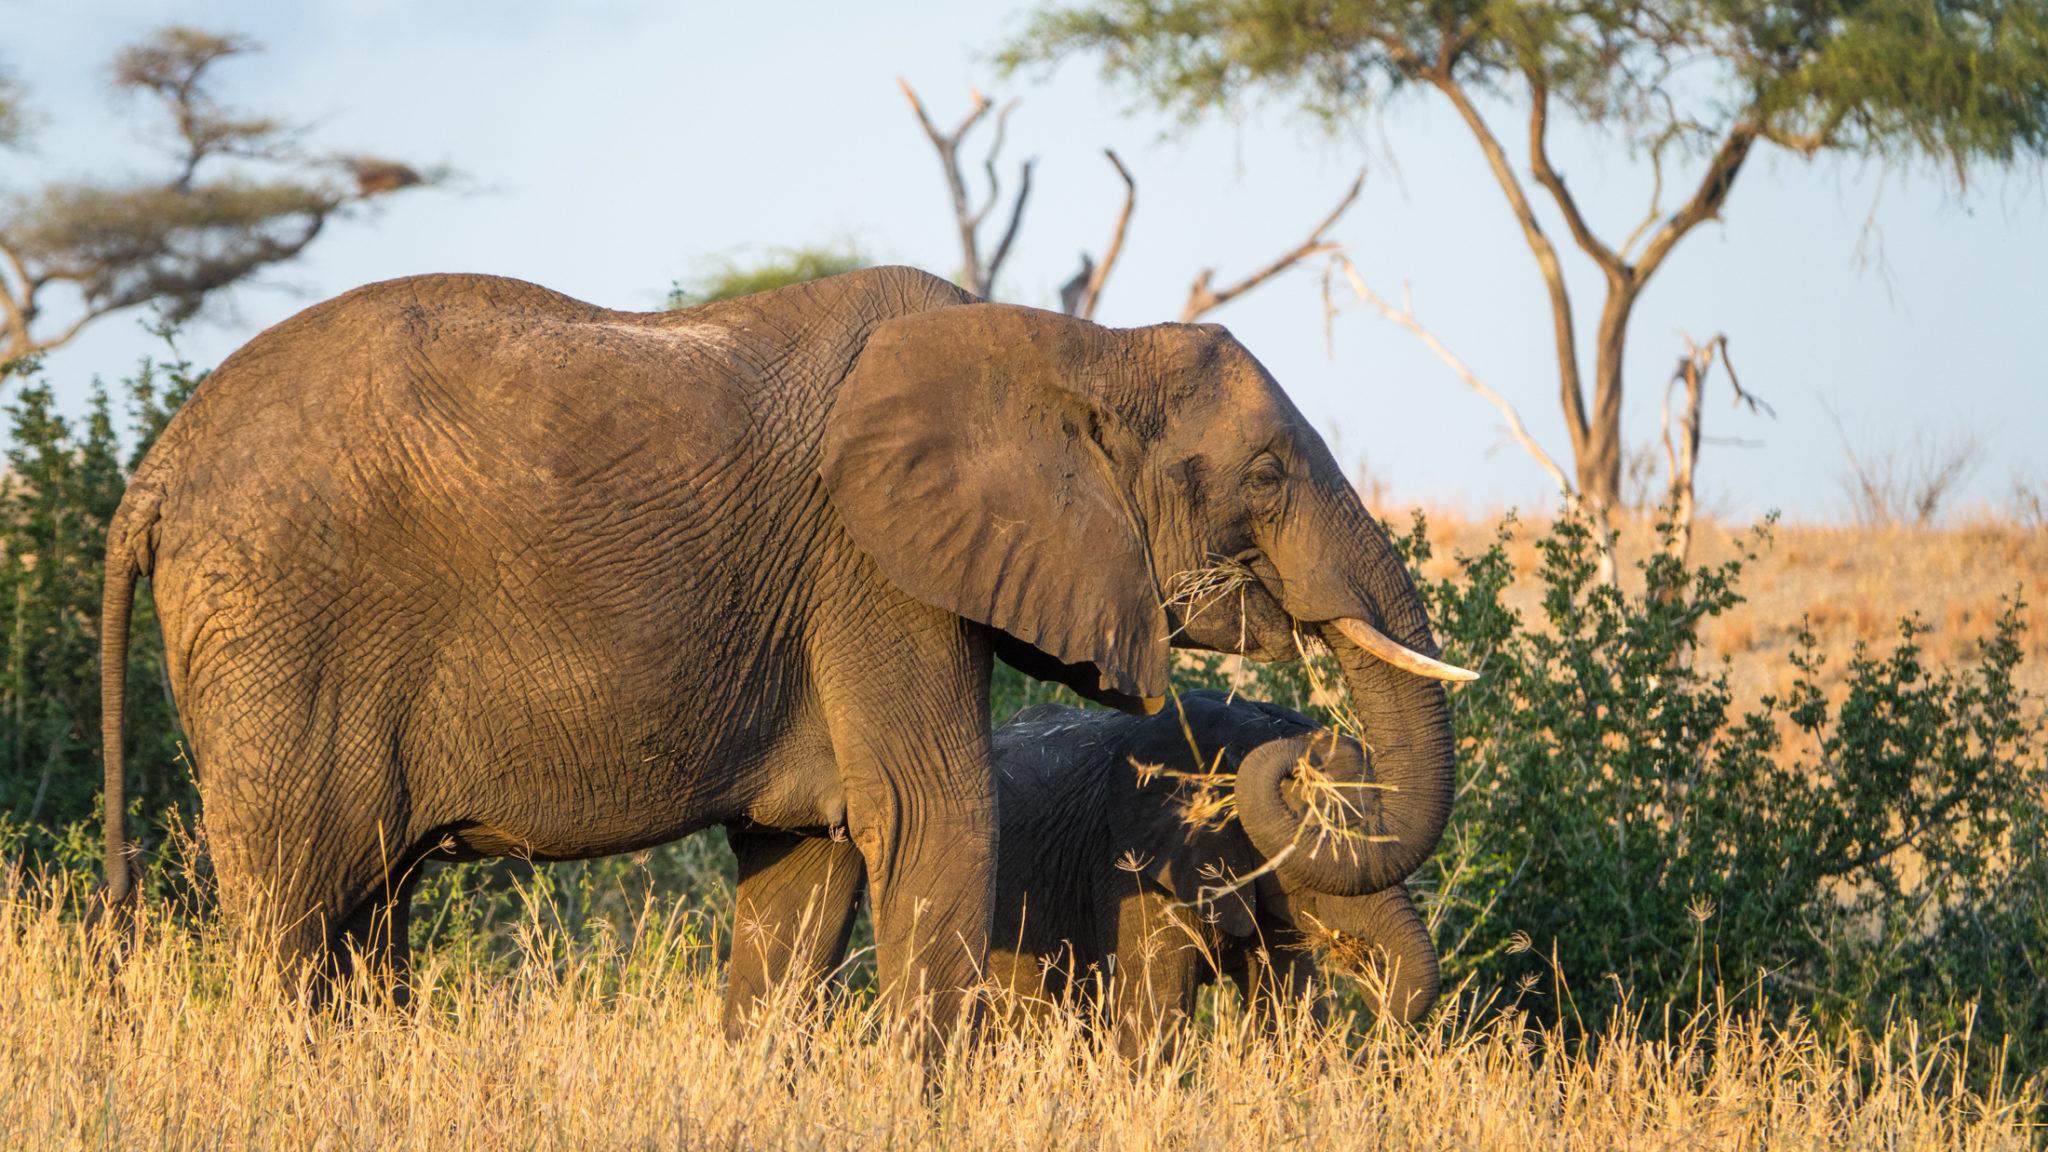 Elefantenkuh mit Baby im Tarangire Nationalpark, Tansania